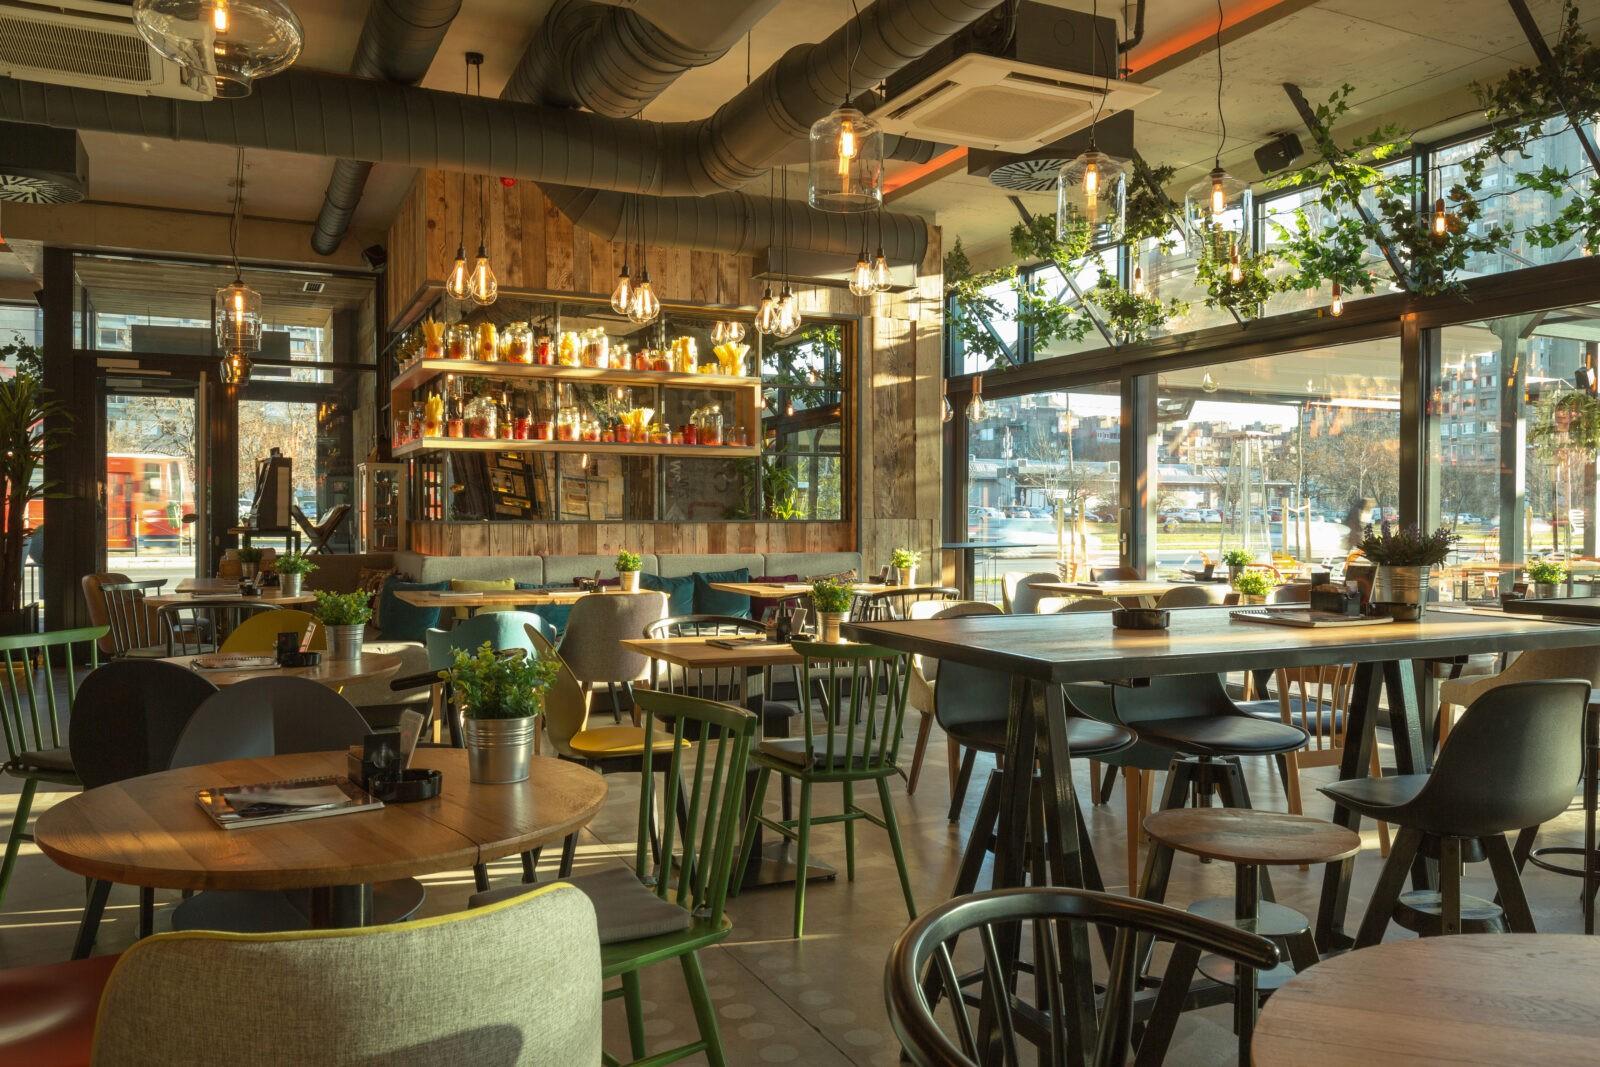 Turnkey Freestanding Hermosa Beach Restaurant